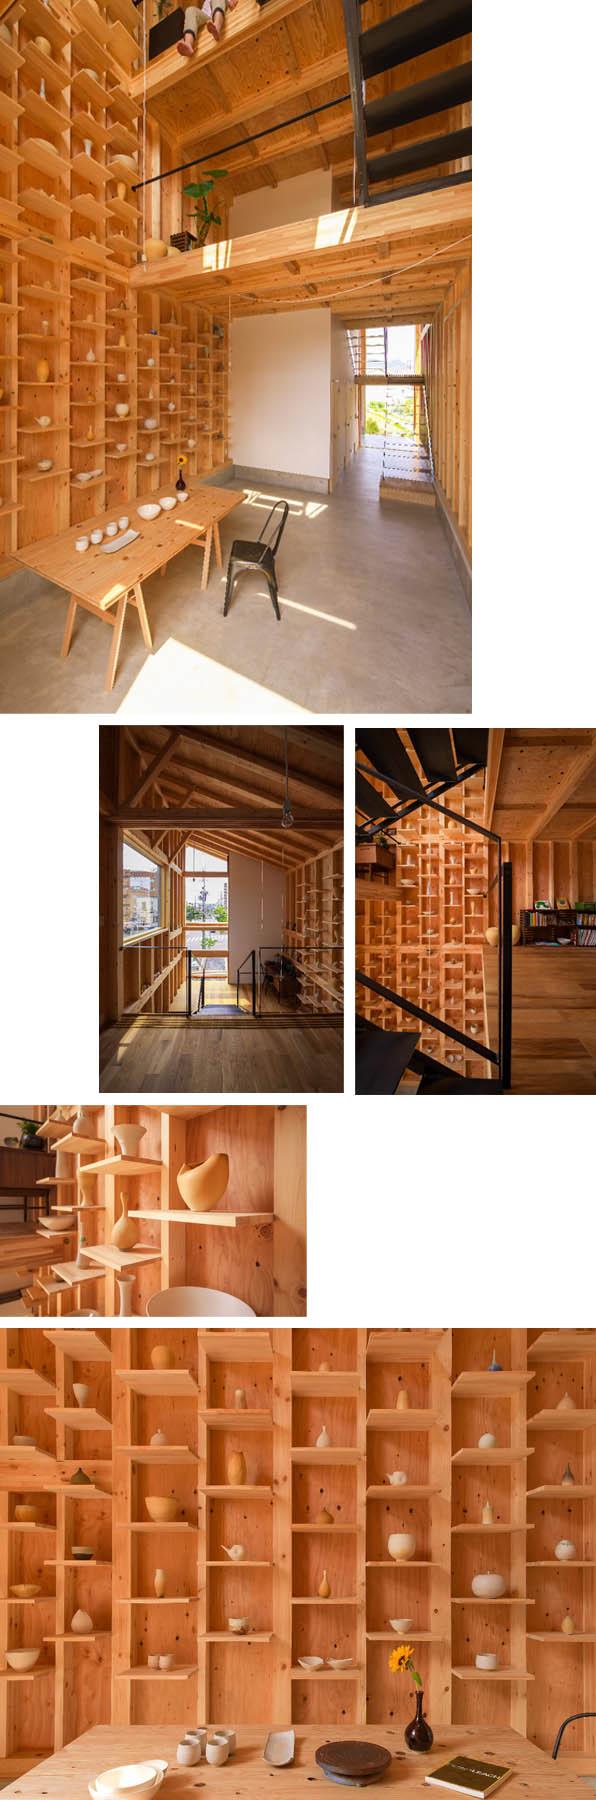 casa museo de la ceramica house-pottery-casa-ceramica-madera-japon-japan-modusvivendiarquitectura-modusvivendi-blog-modus-vivendi-arquitectura-architecture-02